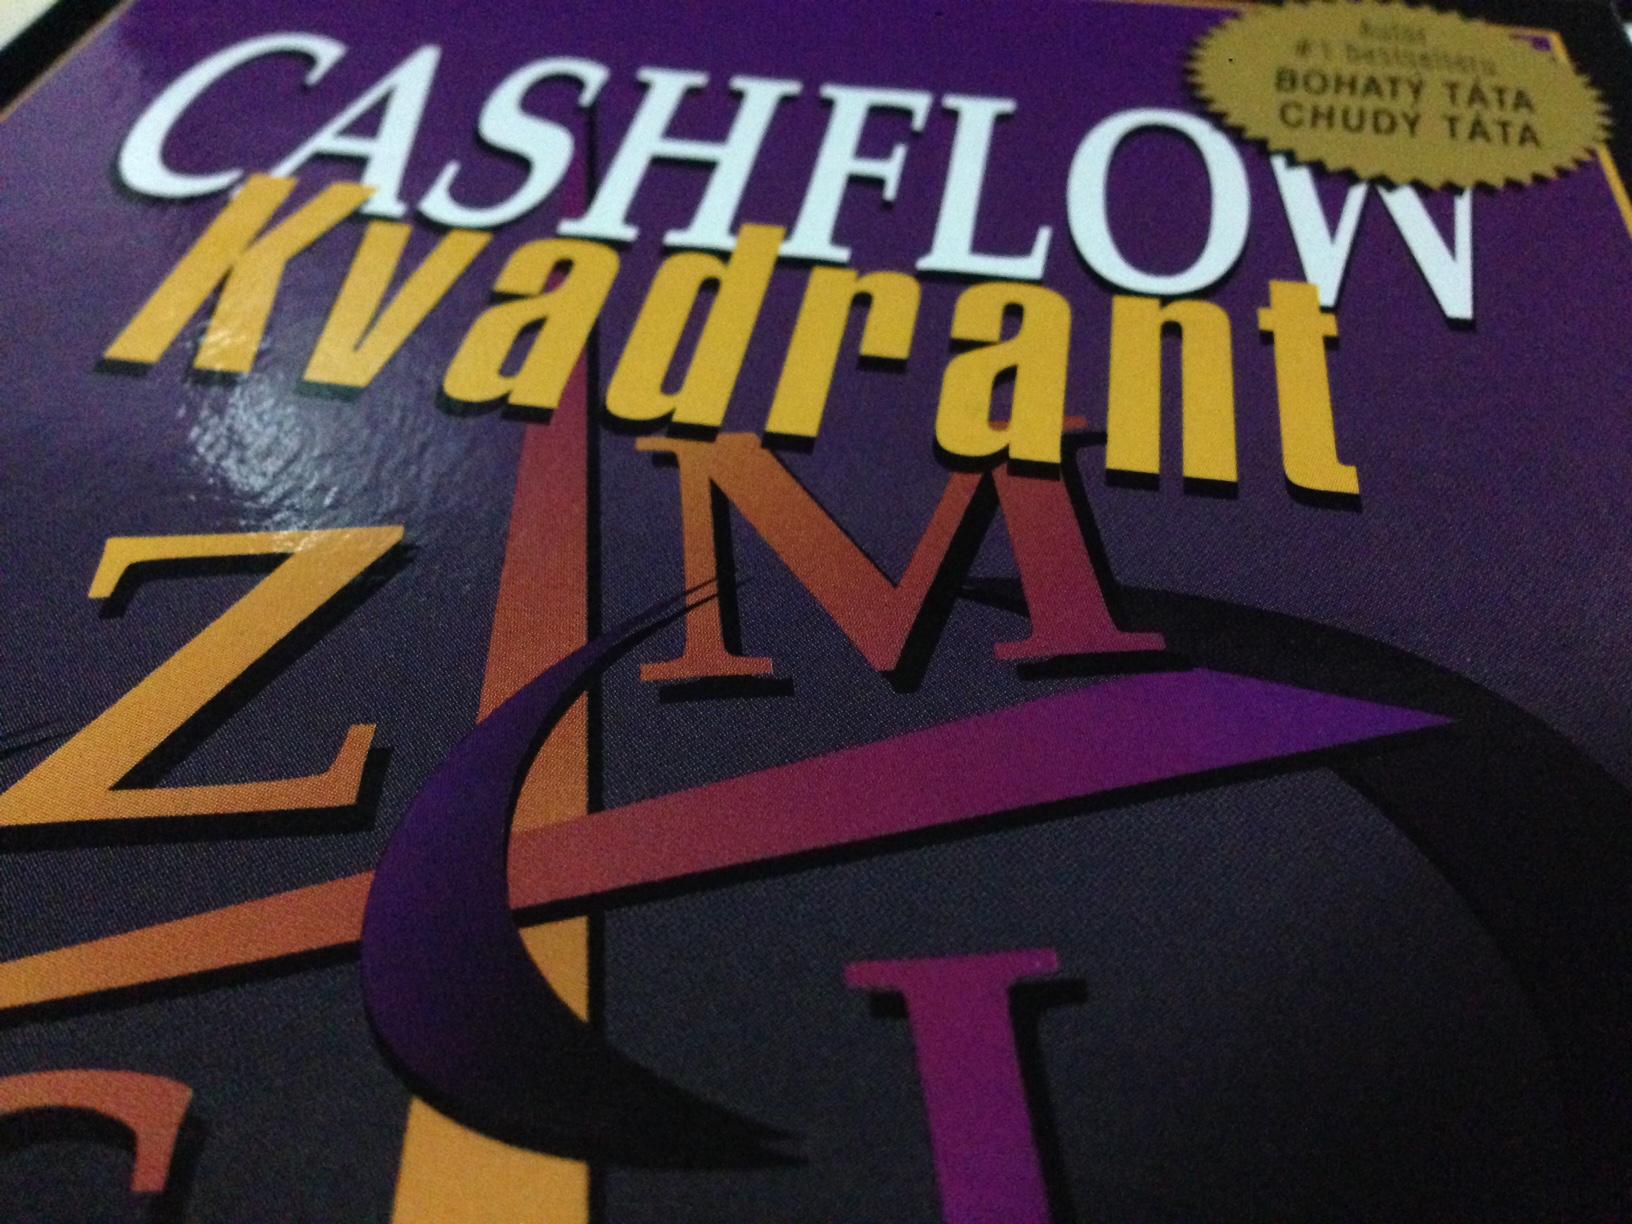 Tomáš Zahradník | Cashflow Kvadrant